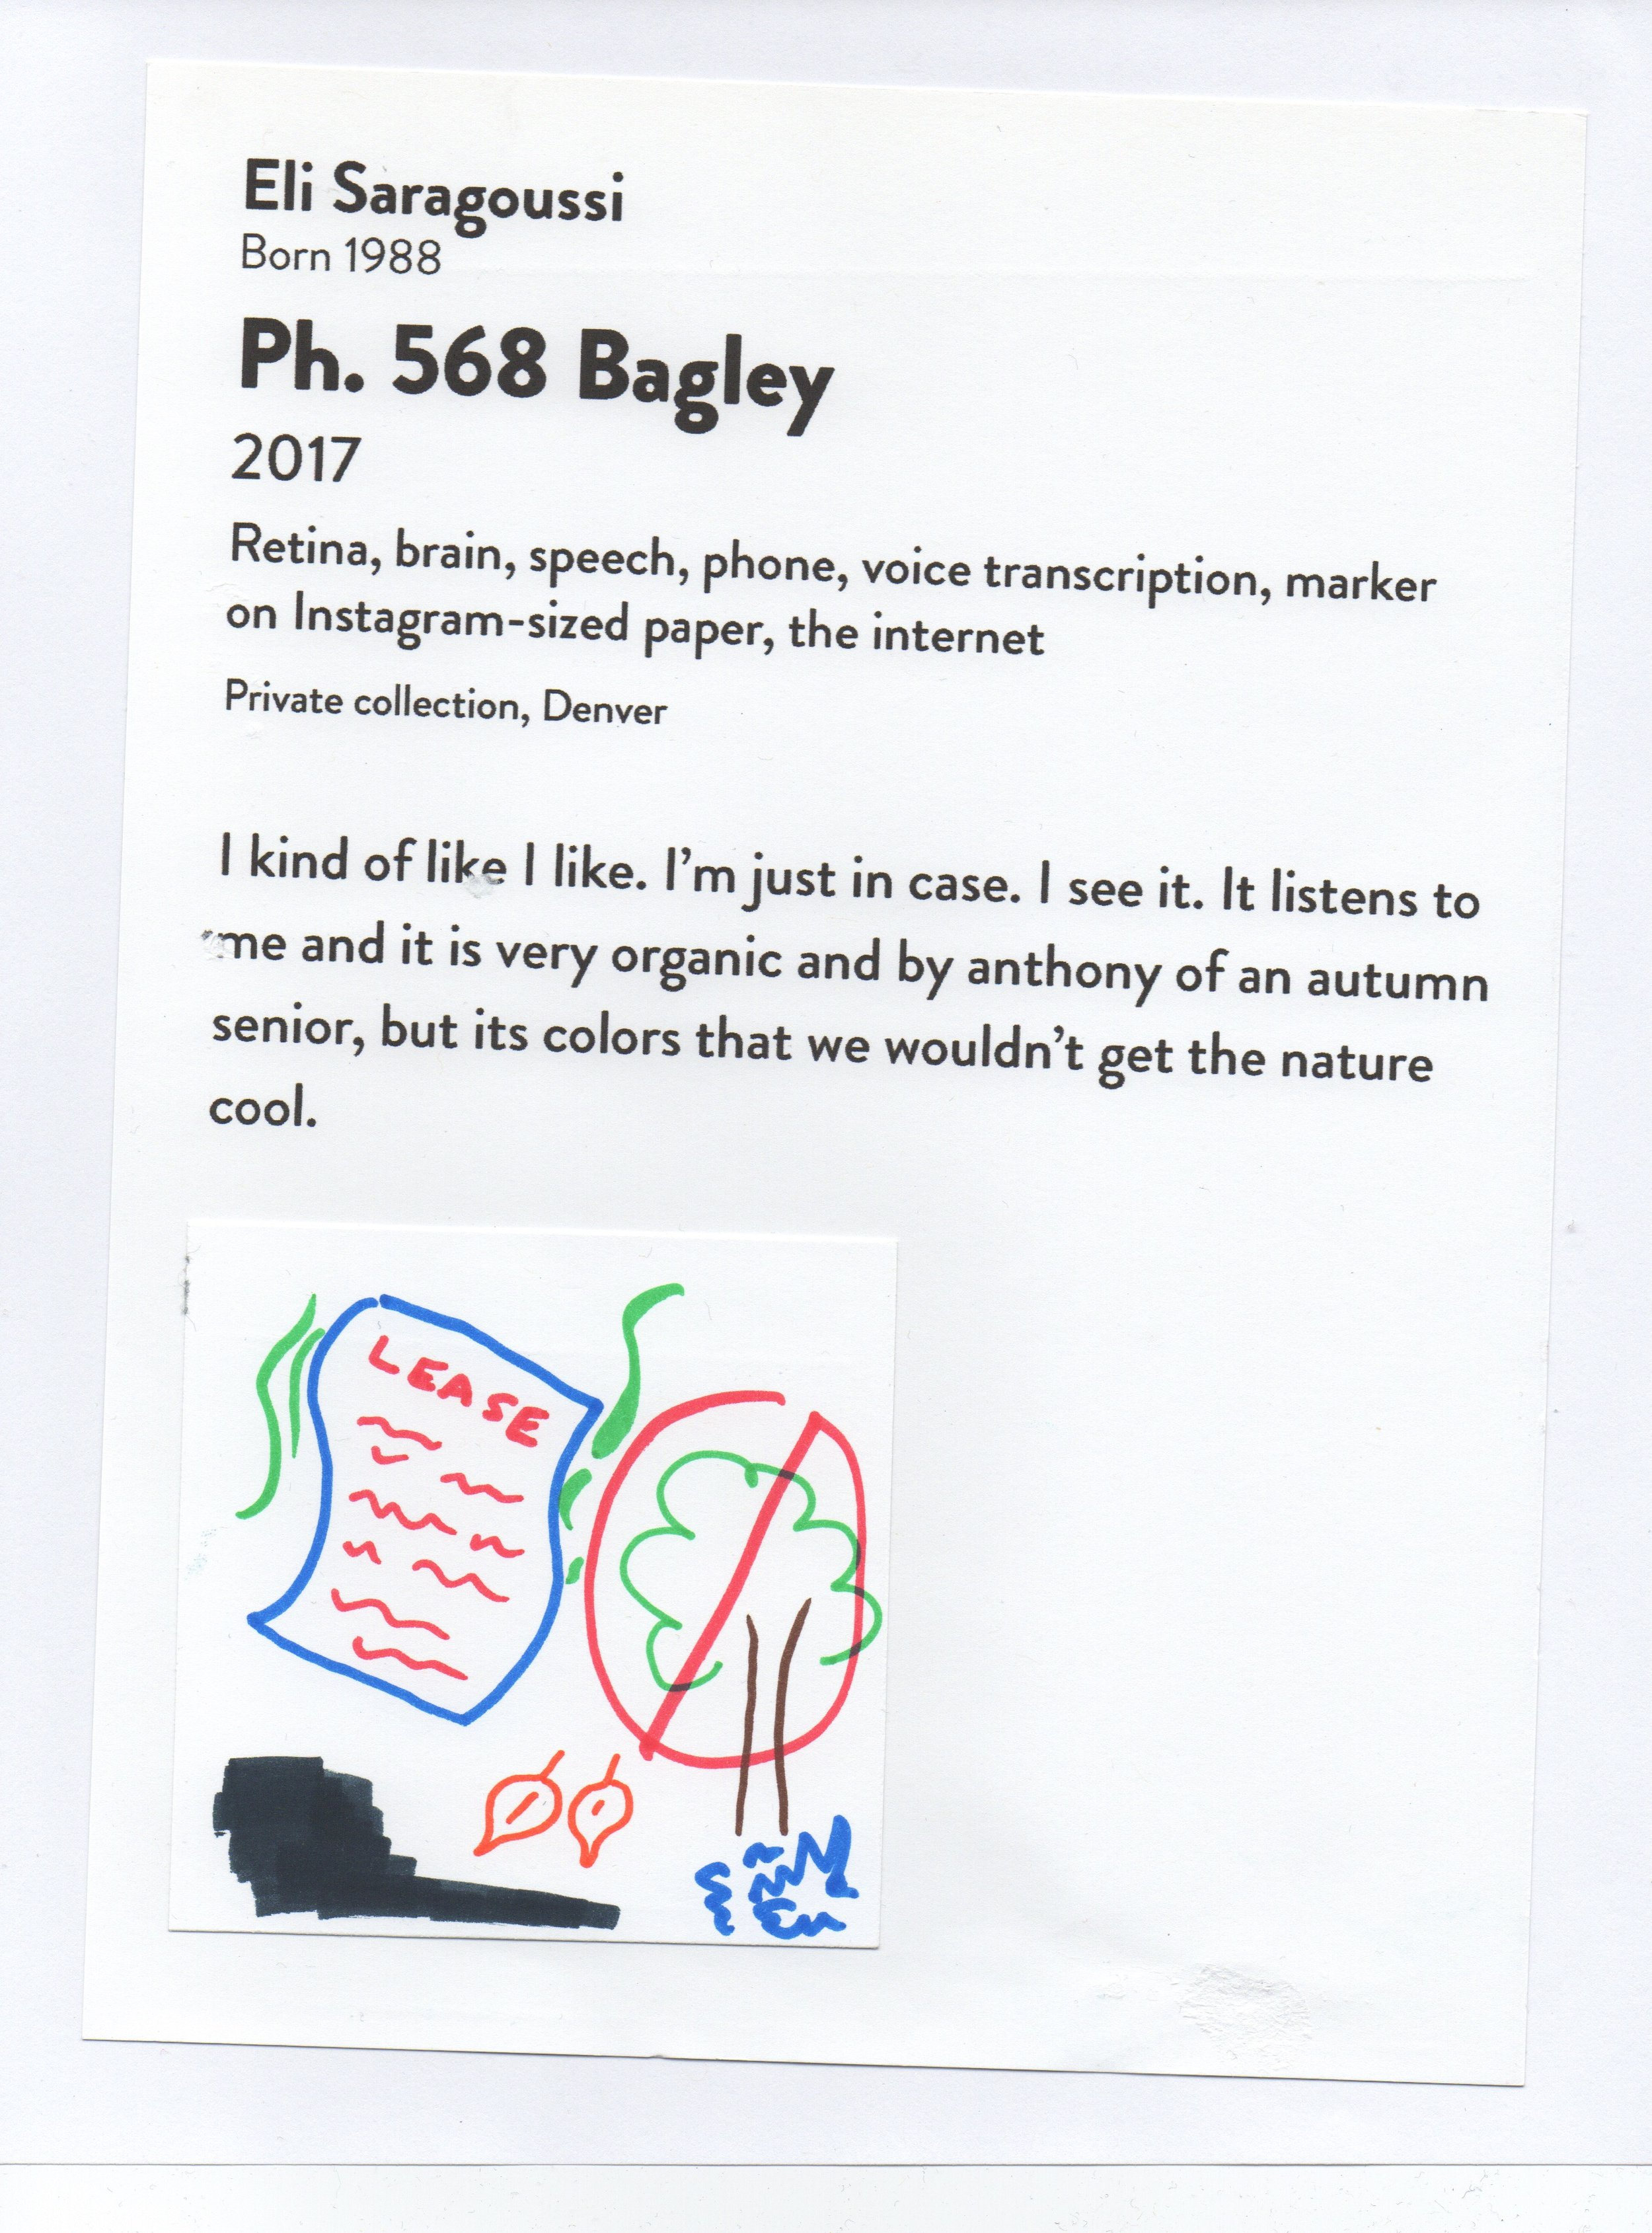 Ph. 568 Bagley DAM Untitled April 28, 2017.jpeg